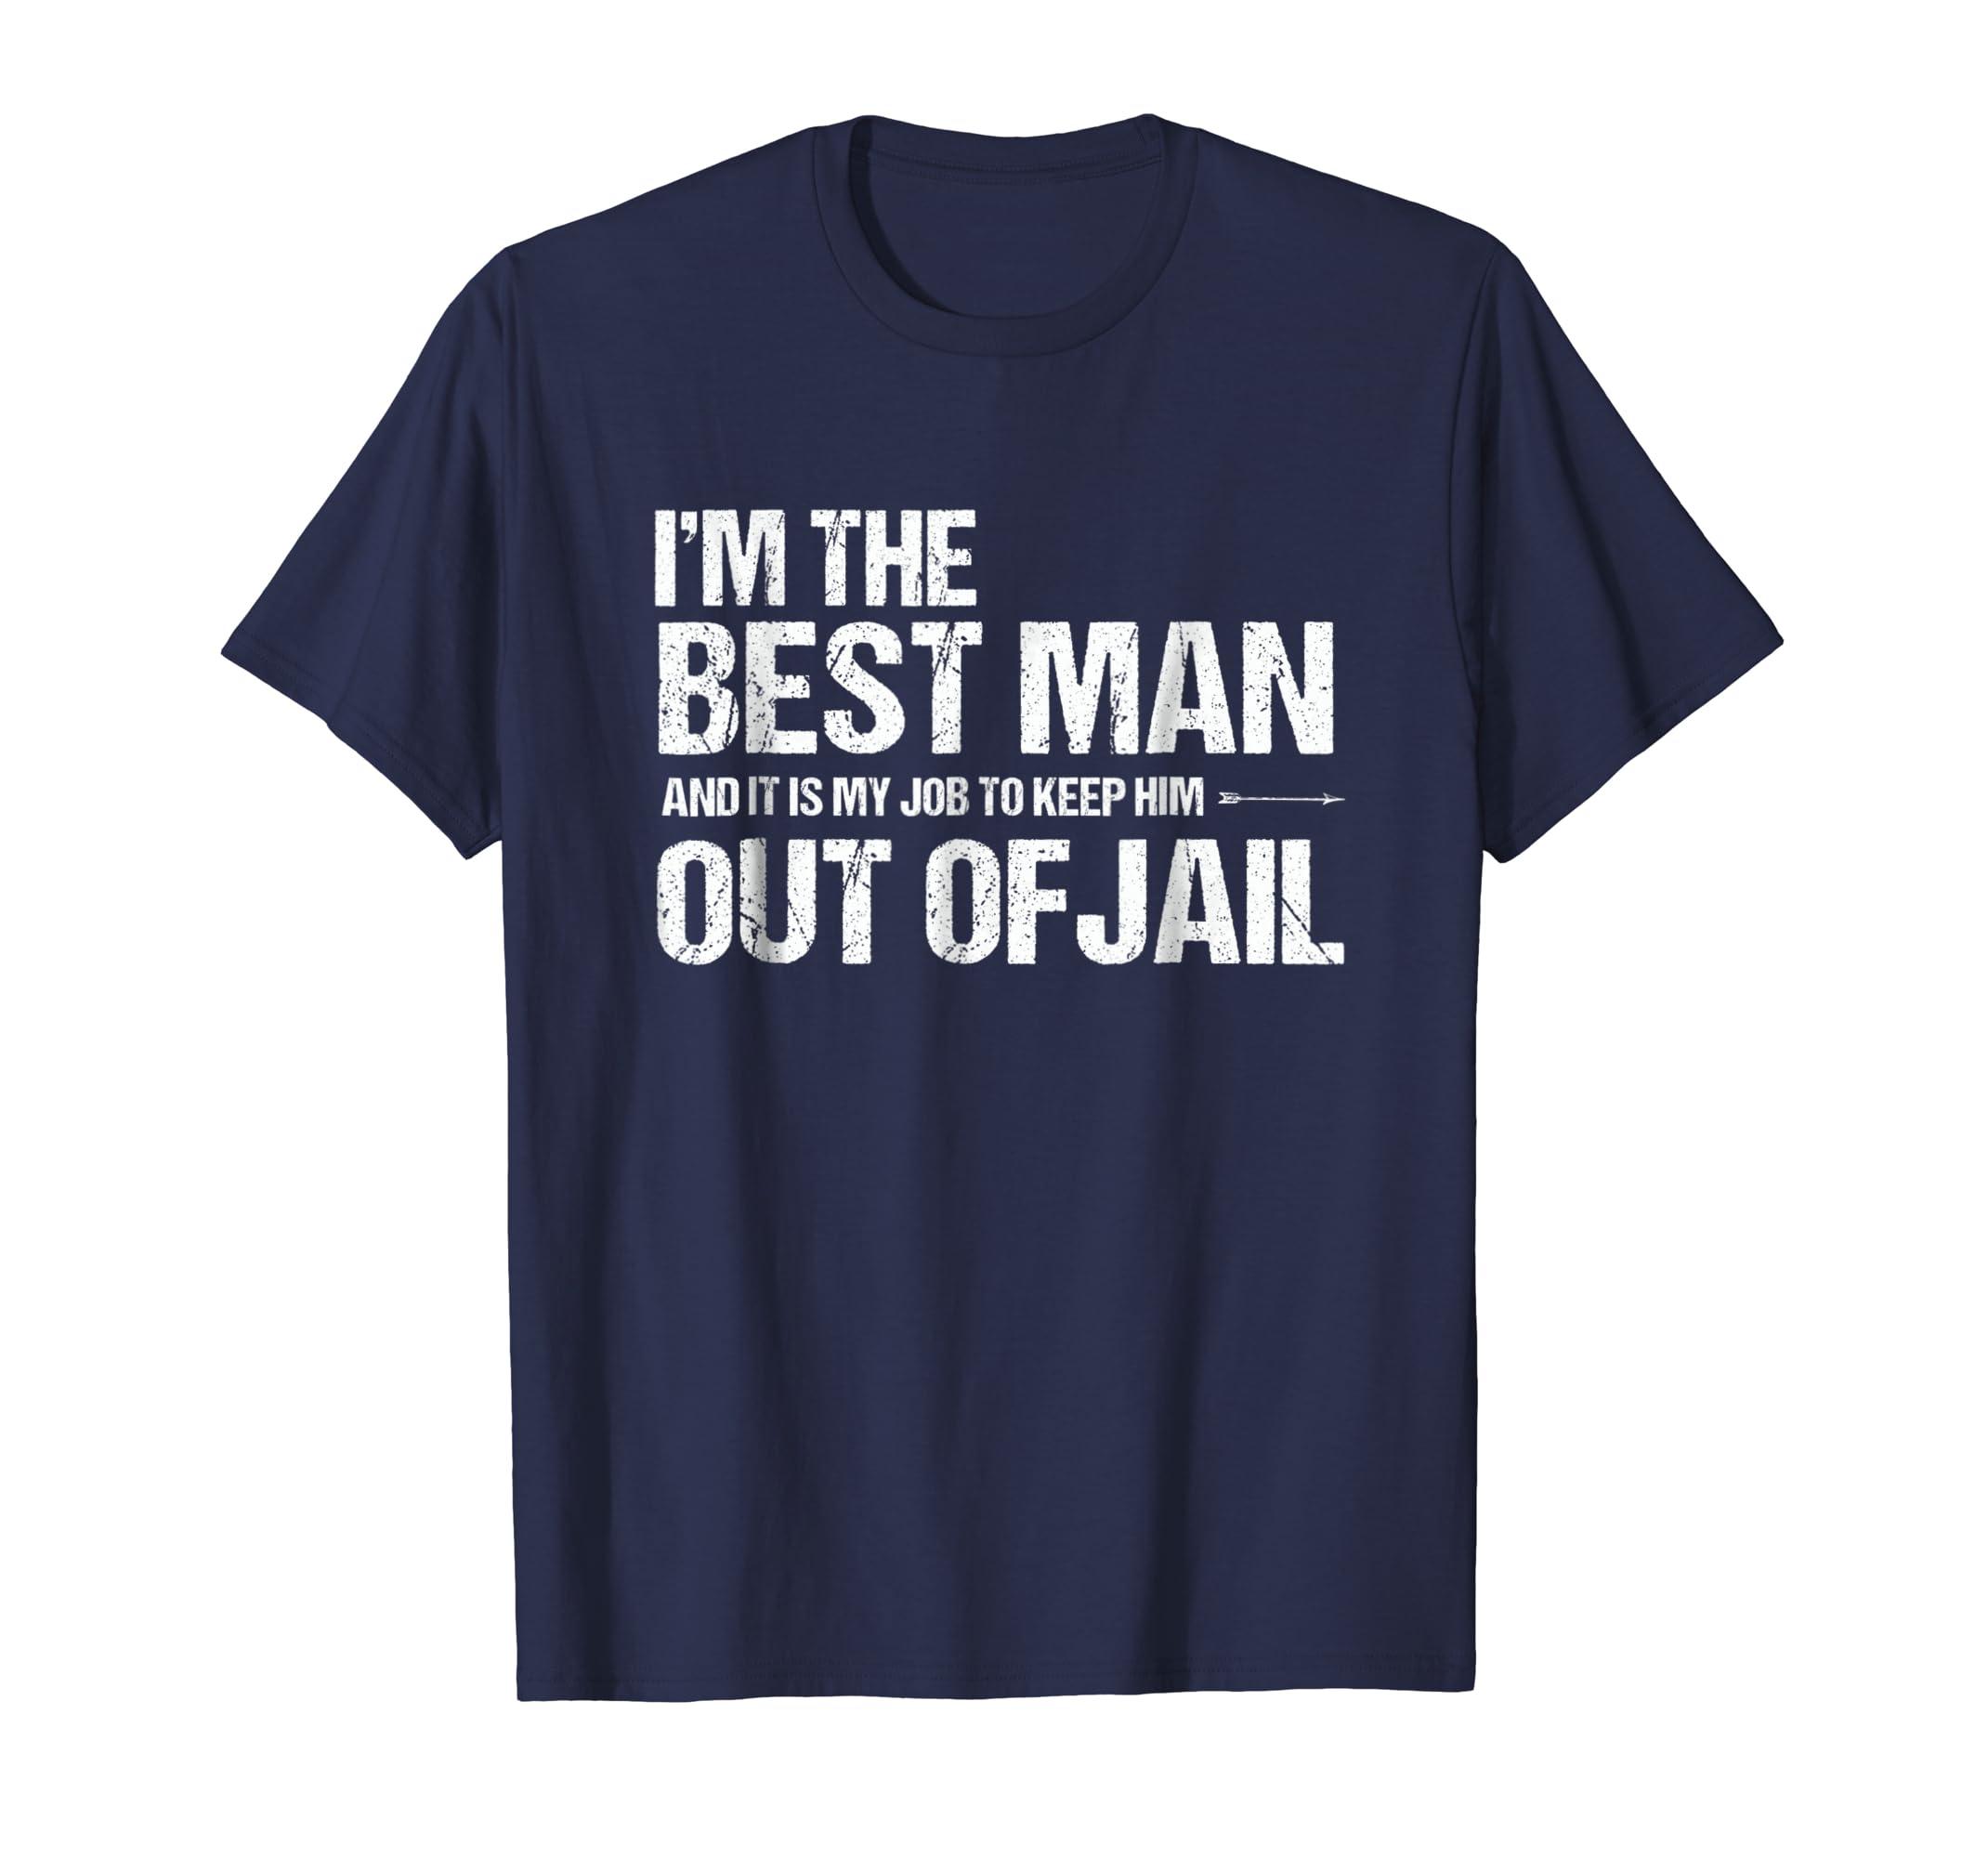 2951a172 Amazon.com: Best Man Bachelor Party Shirt | Funny Best Man Tshirt: Clothing